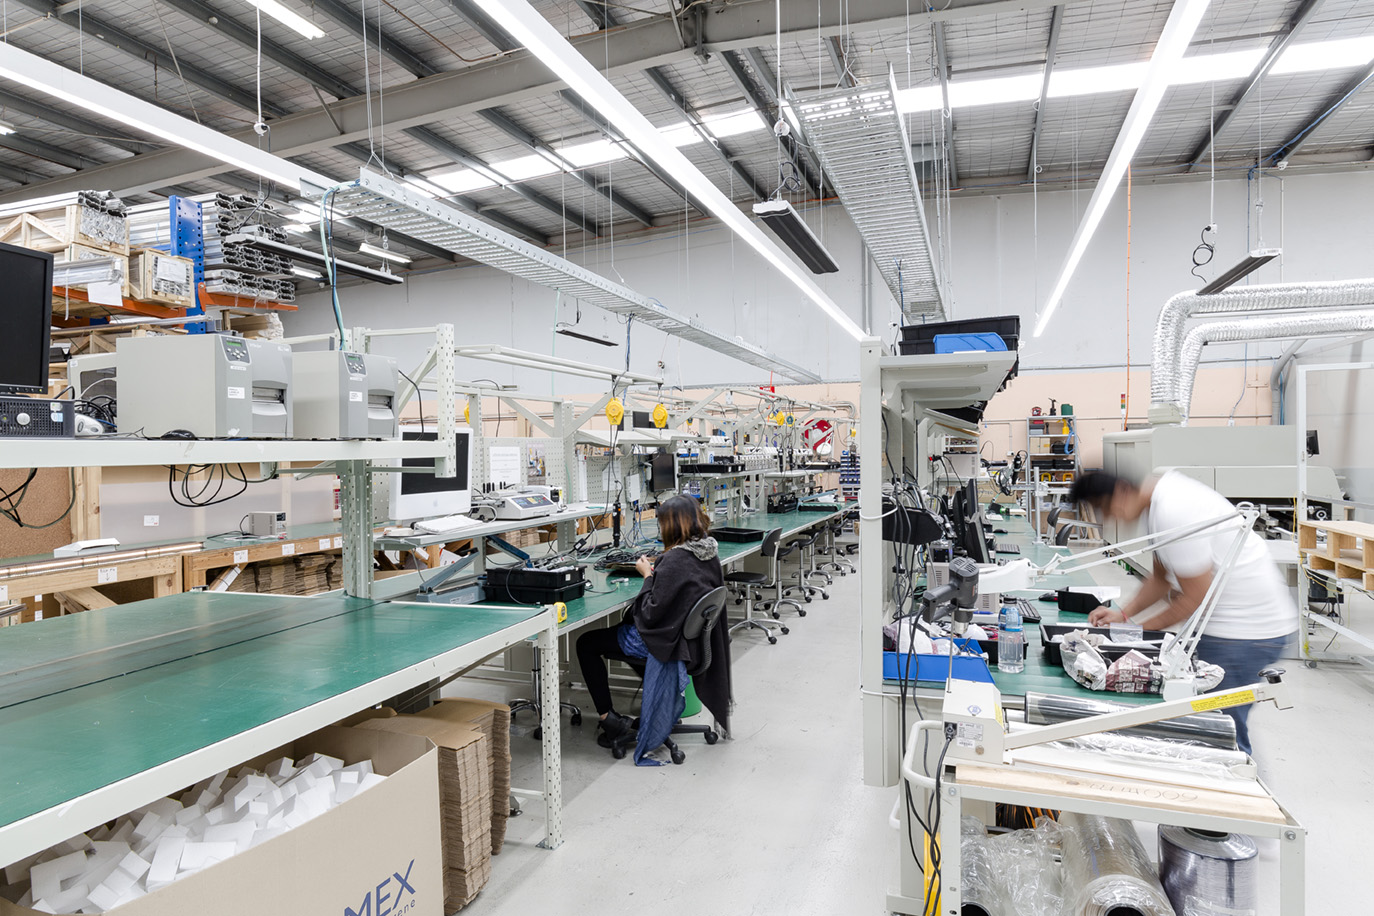 ENTTEC_Factory Images_219.jpg